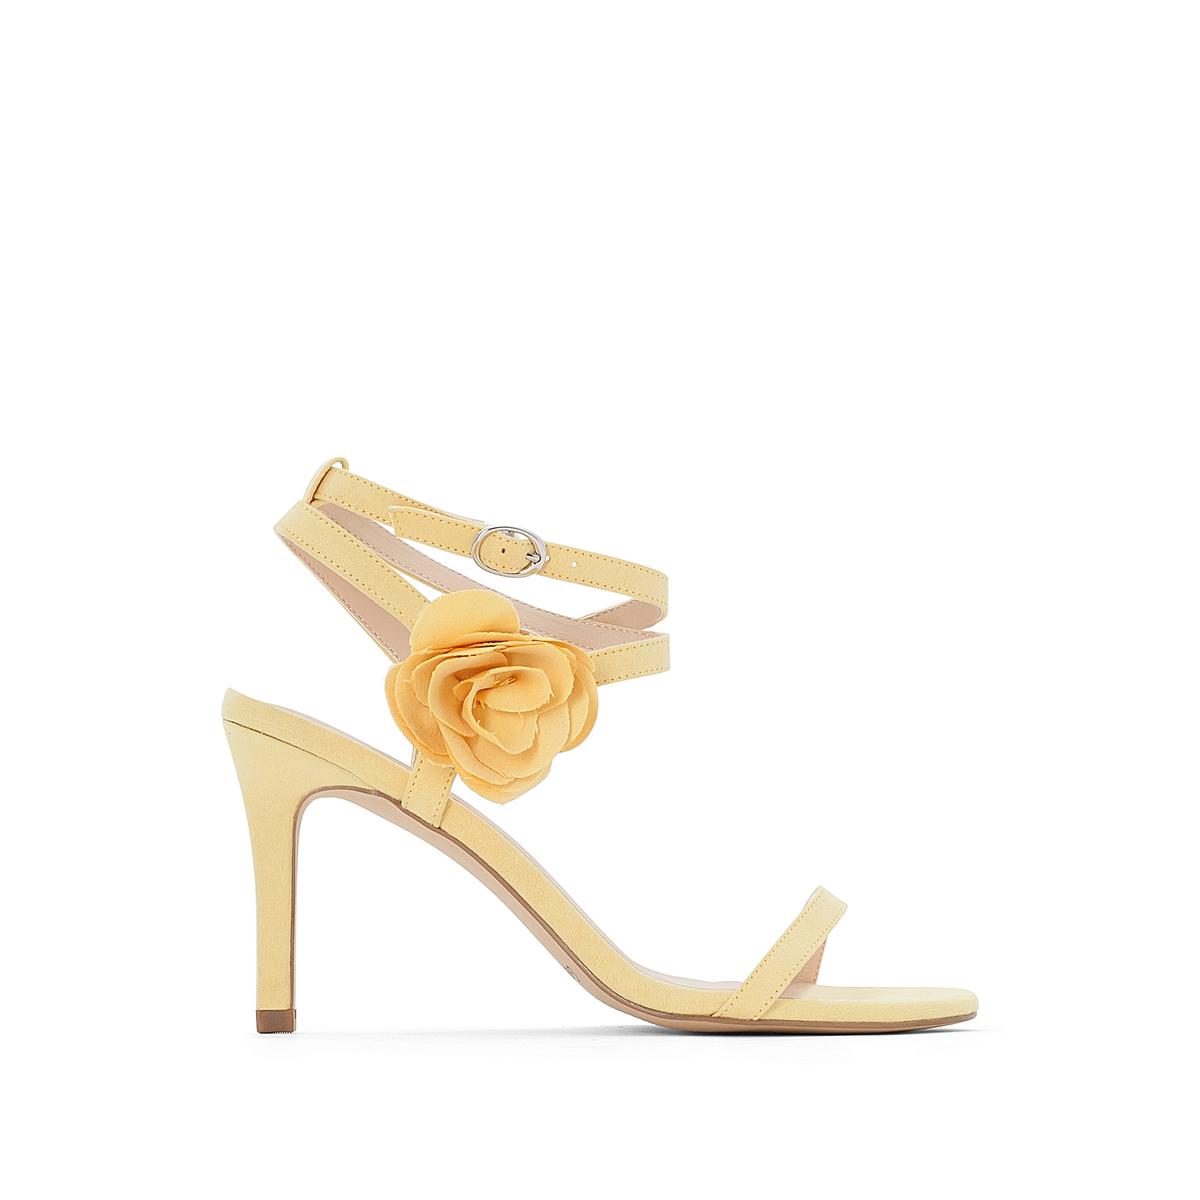 Sandálias em sintético